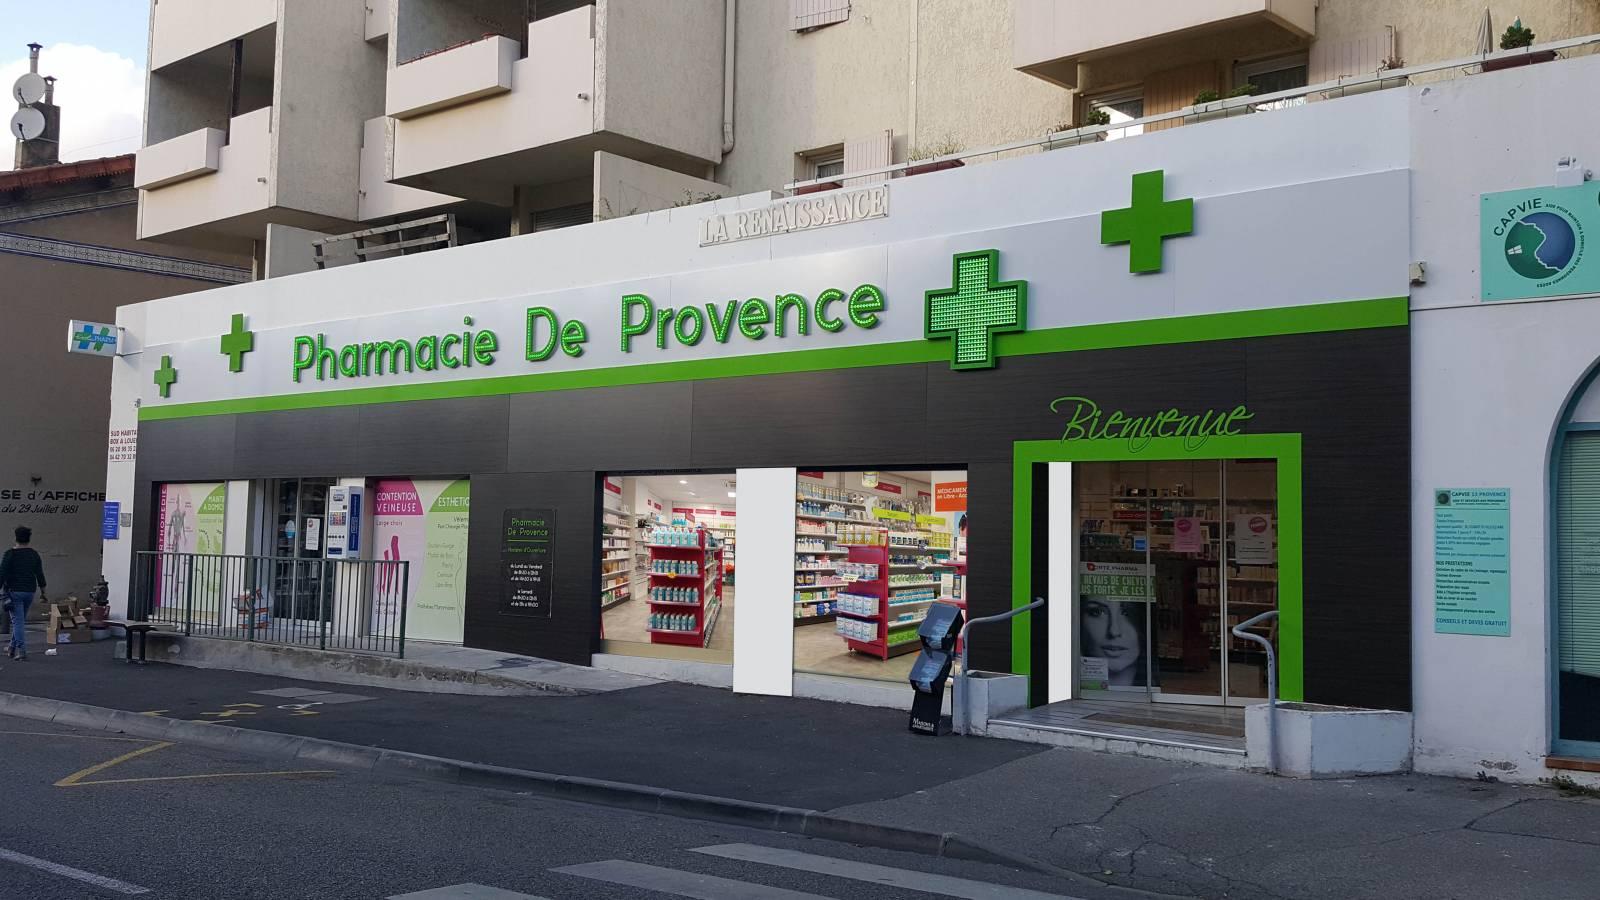 Pharmacie aubagne proche de auchan pharmacie et parapharmacie aubagne centre ville pharmacie - Pharmacie garde salon de provence ...